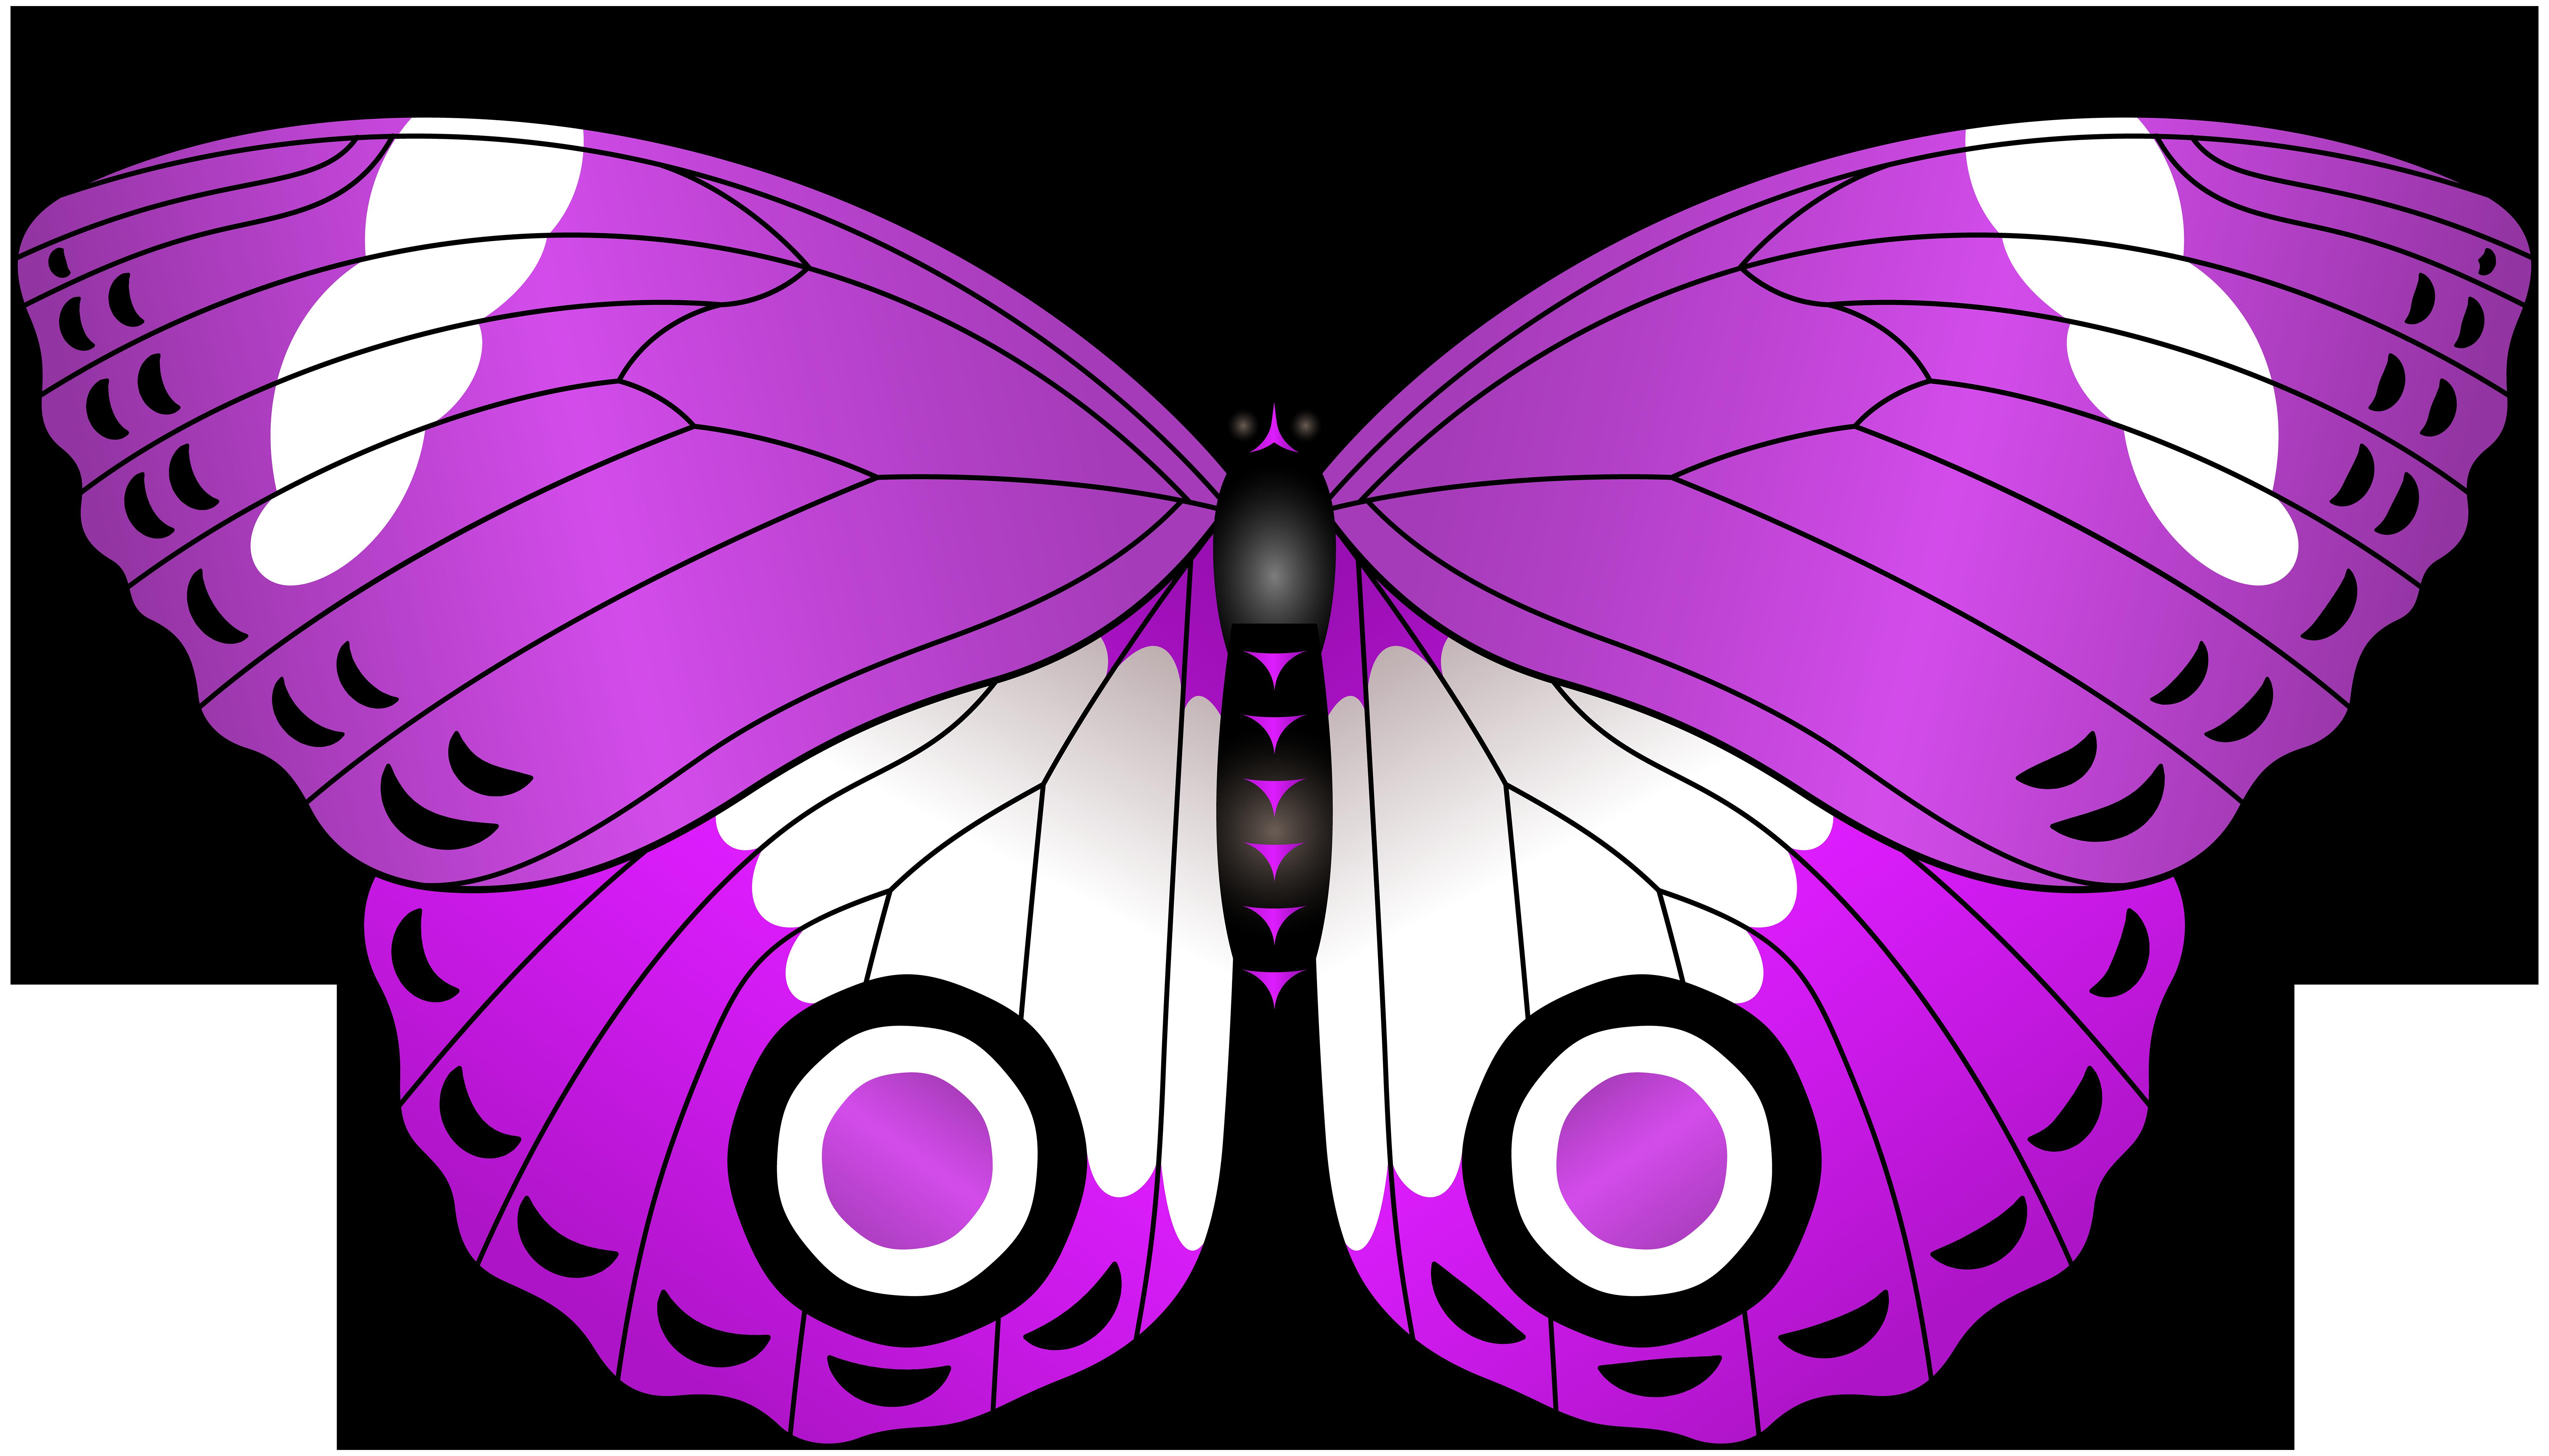 Purple Butterfly Transparent Clip Art Image.